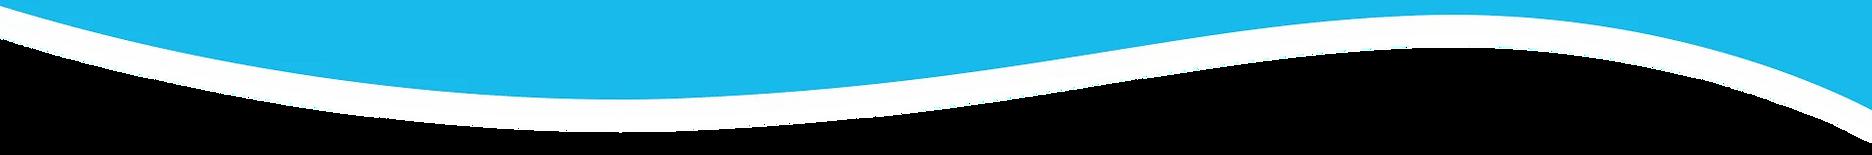 top-transition-blue2.webp